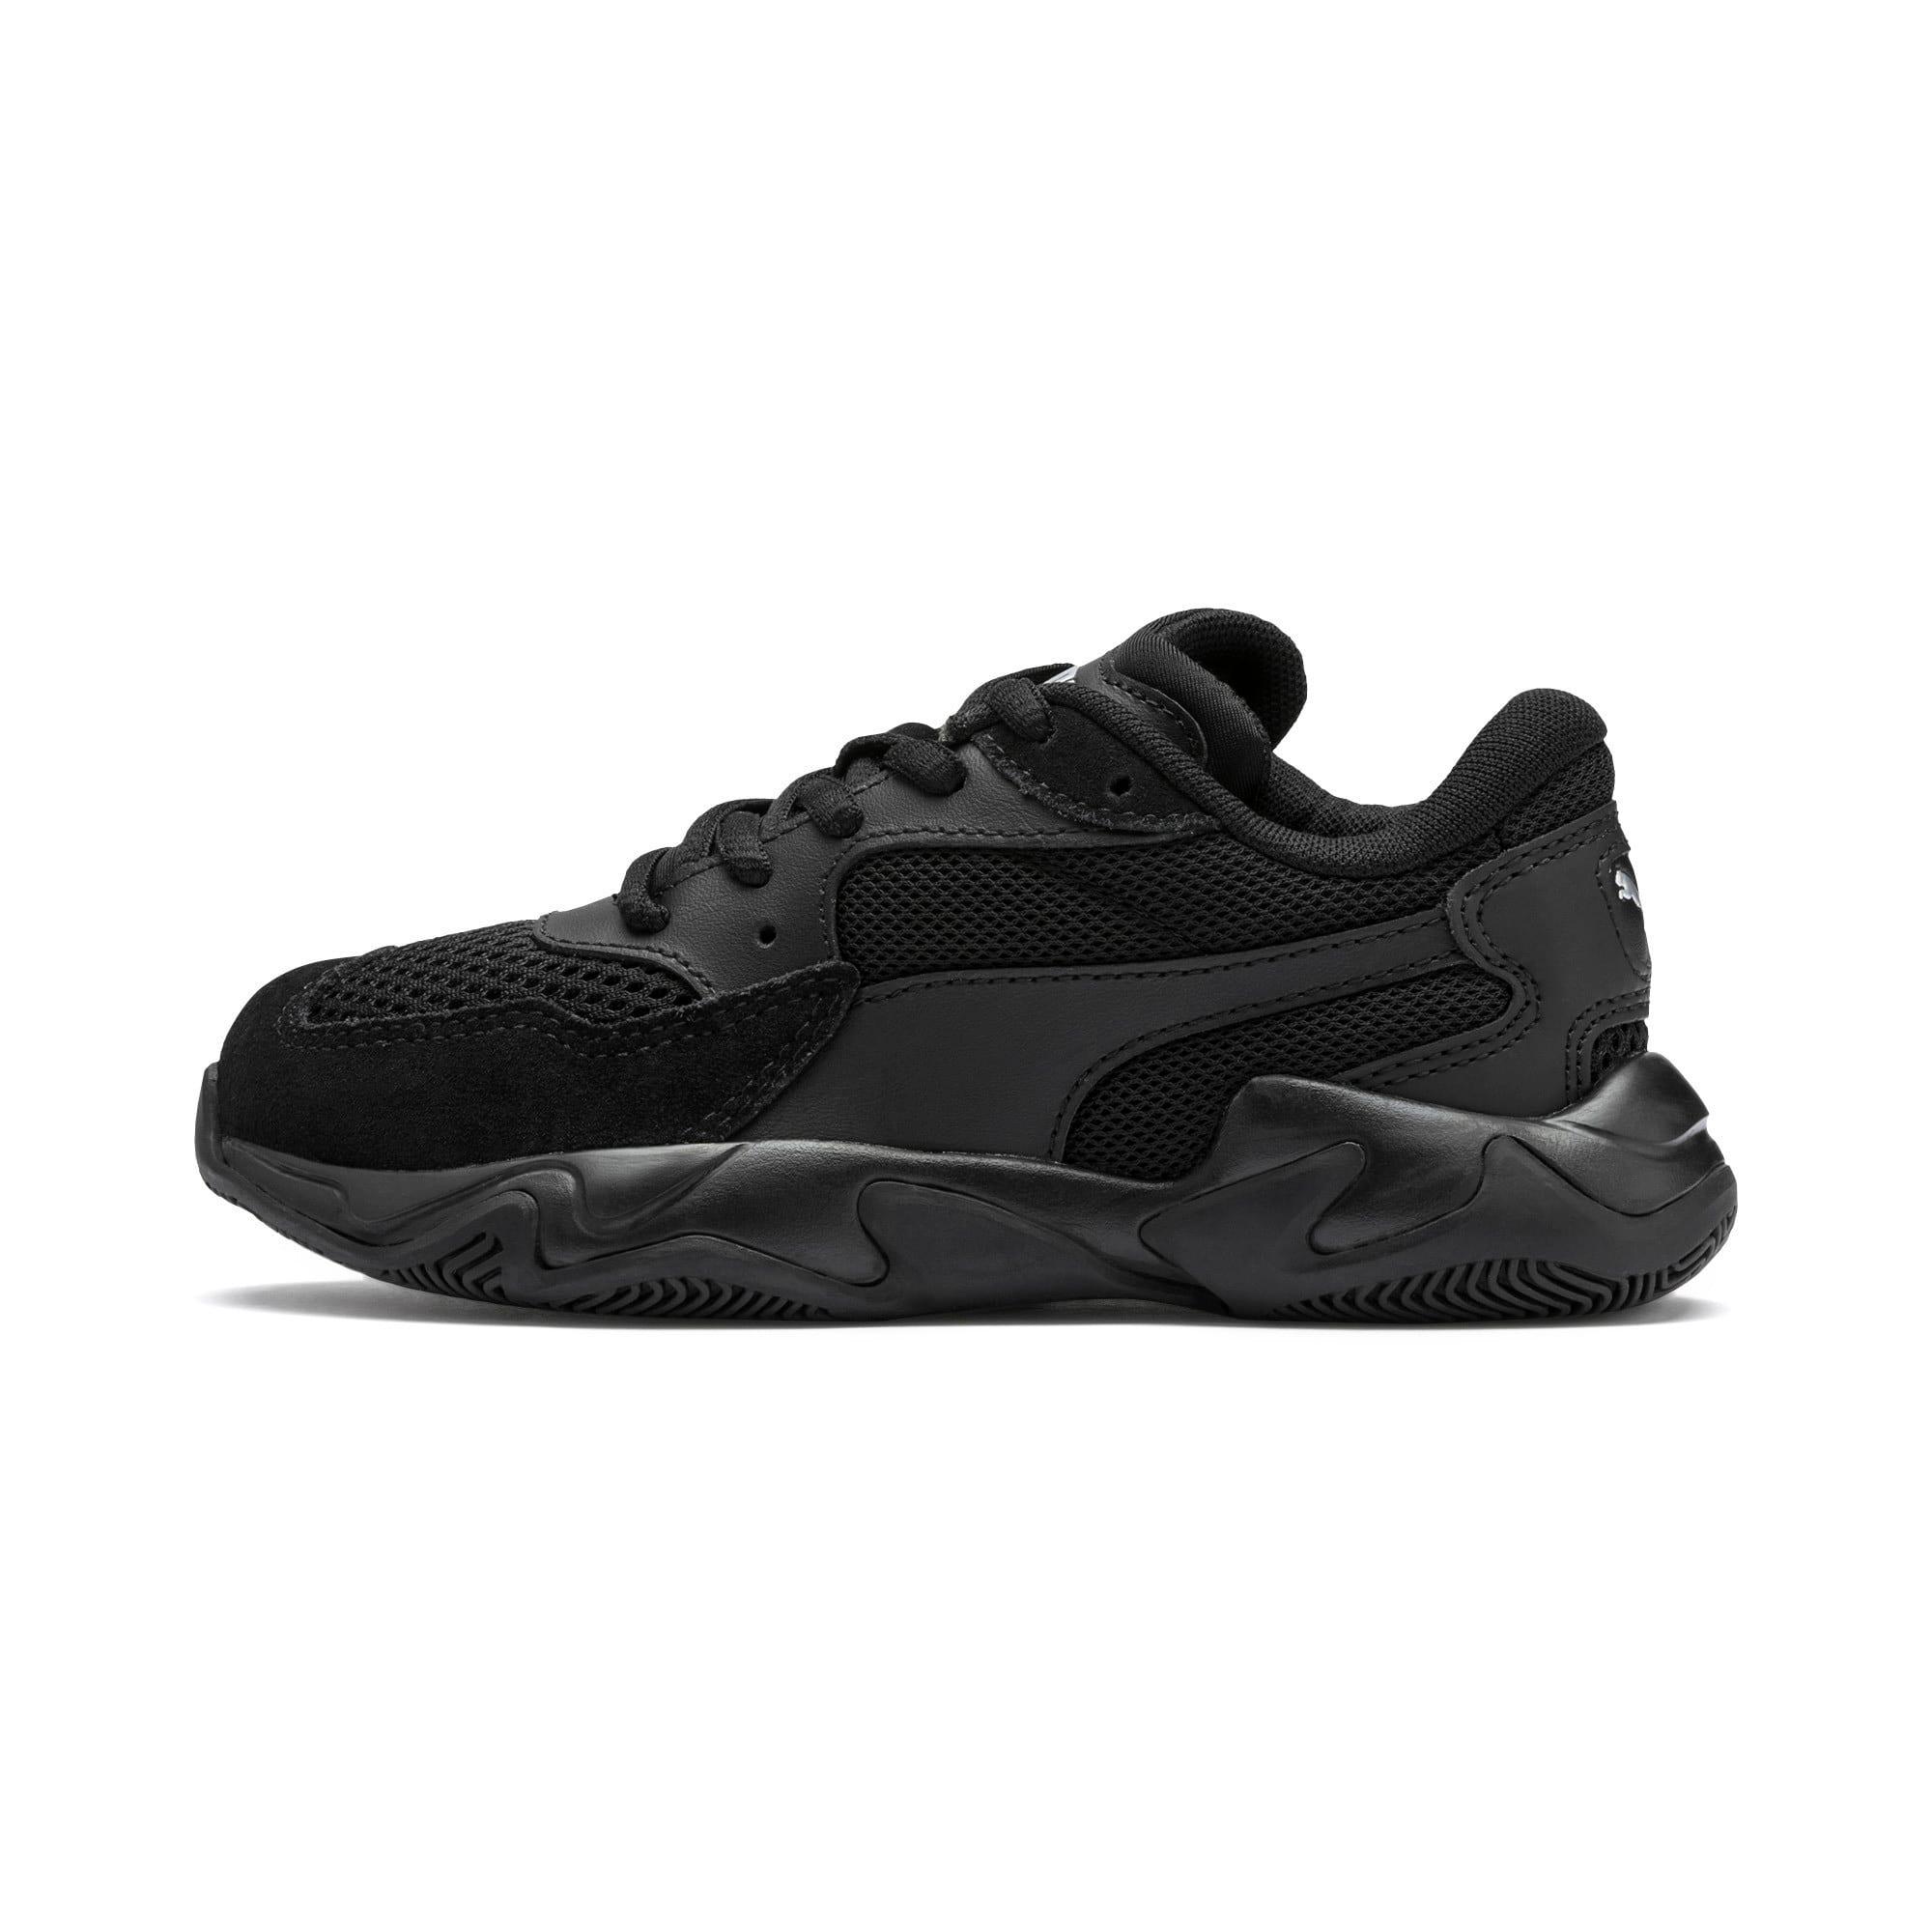 Thumbnail 1 of Storm Origin Little Kids' Shoes, Puma Black, medium